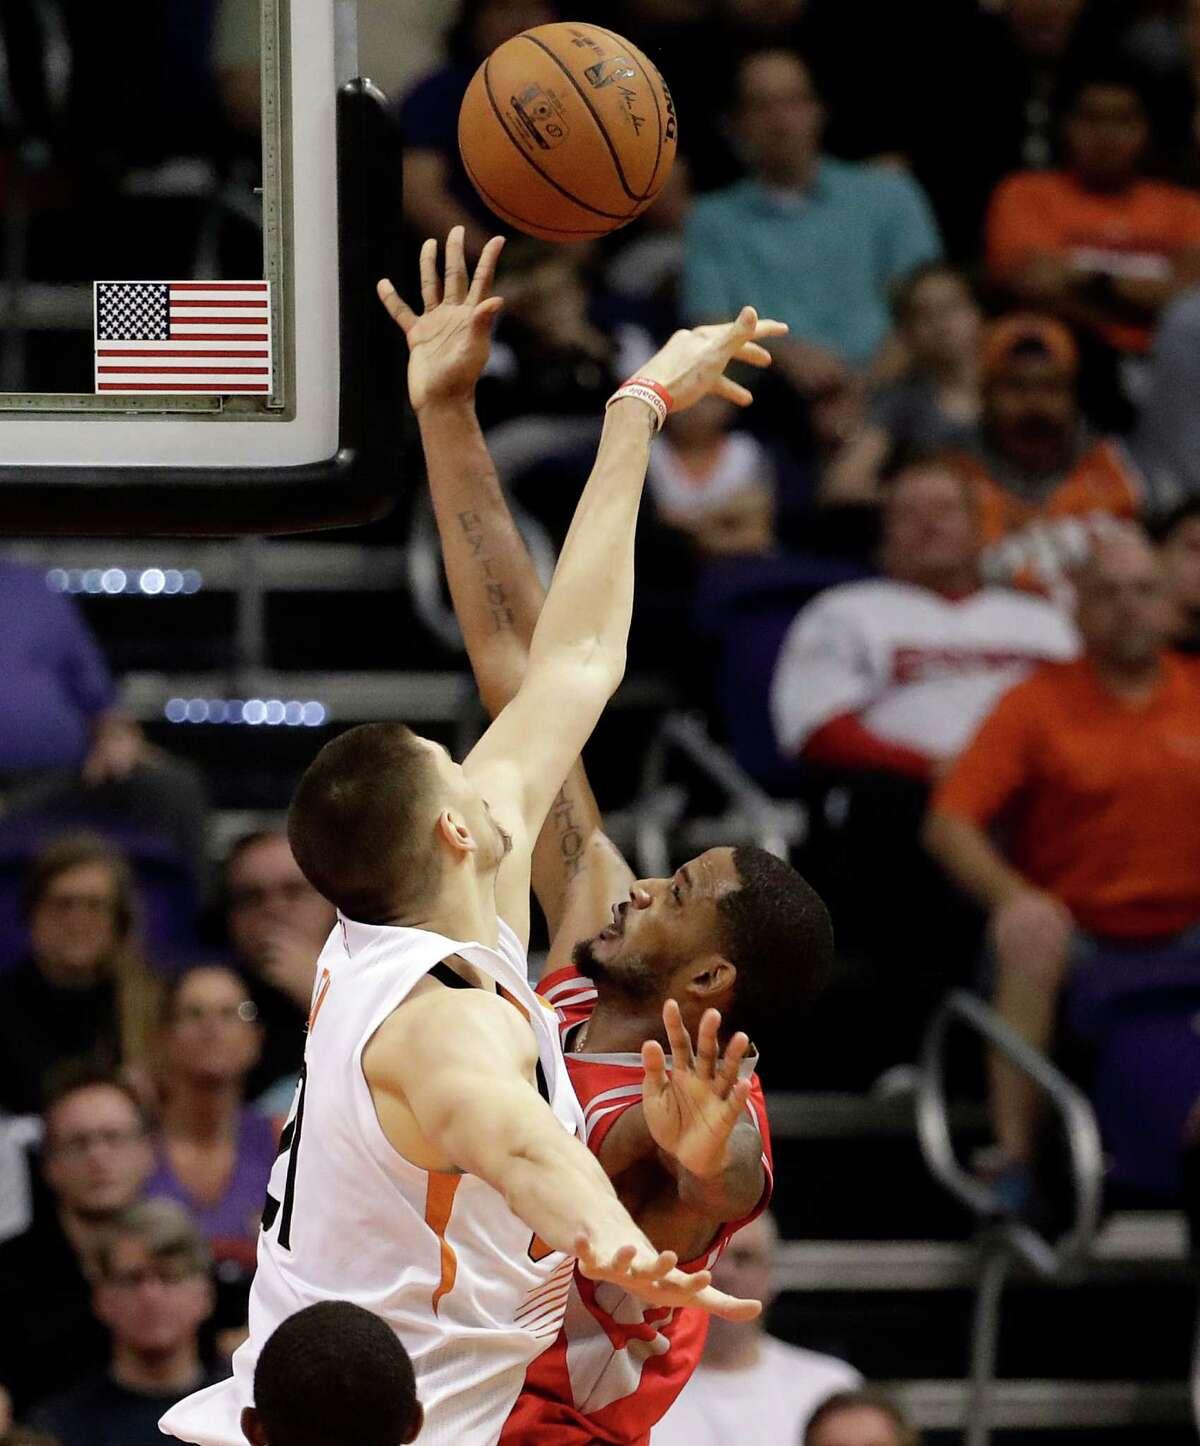 Phoenix Suns center Alex Len, left, blocks the shot of Houston Rockets guard Eric Gordon during the second half of an NBA basketball game, Wednesday, Dec. 21, 2016, in Phoenix. (AP Photo/Matt York)